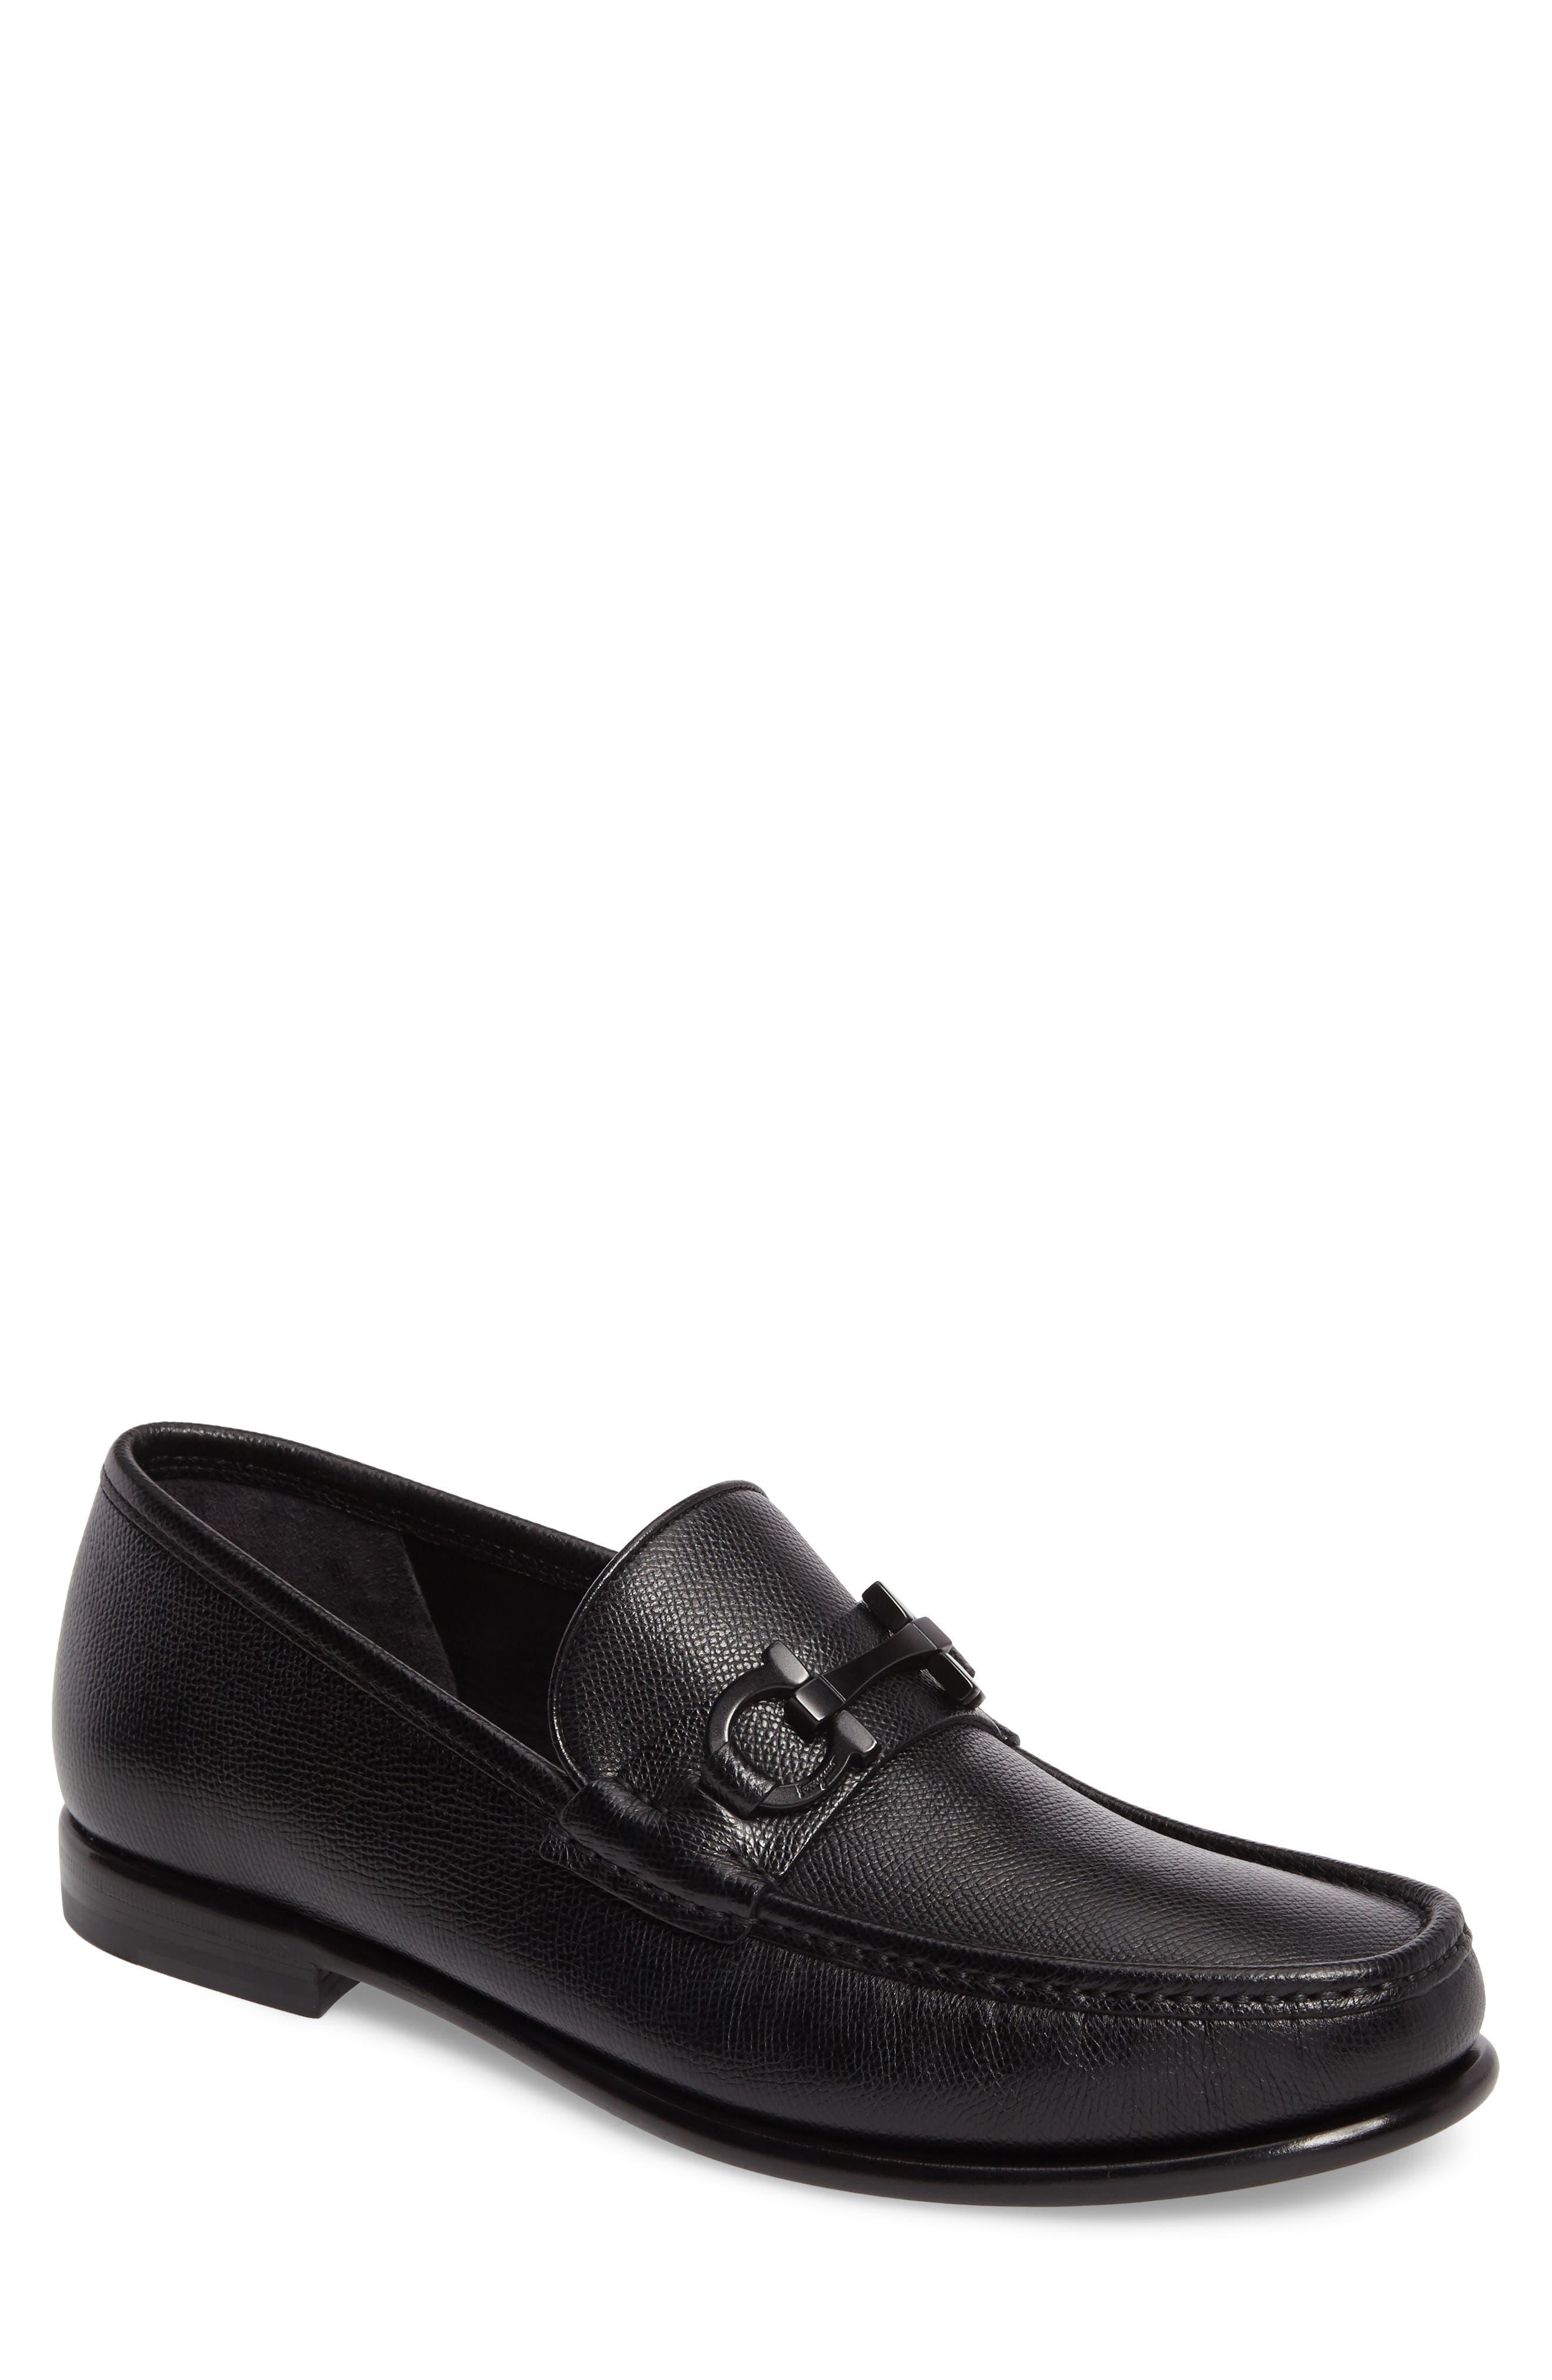 Crown Bit Loafer,                         Main,                         color, NERO